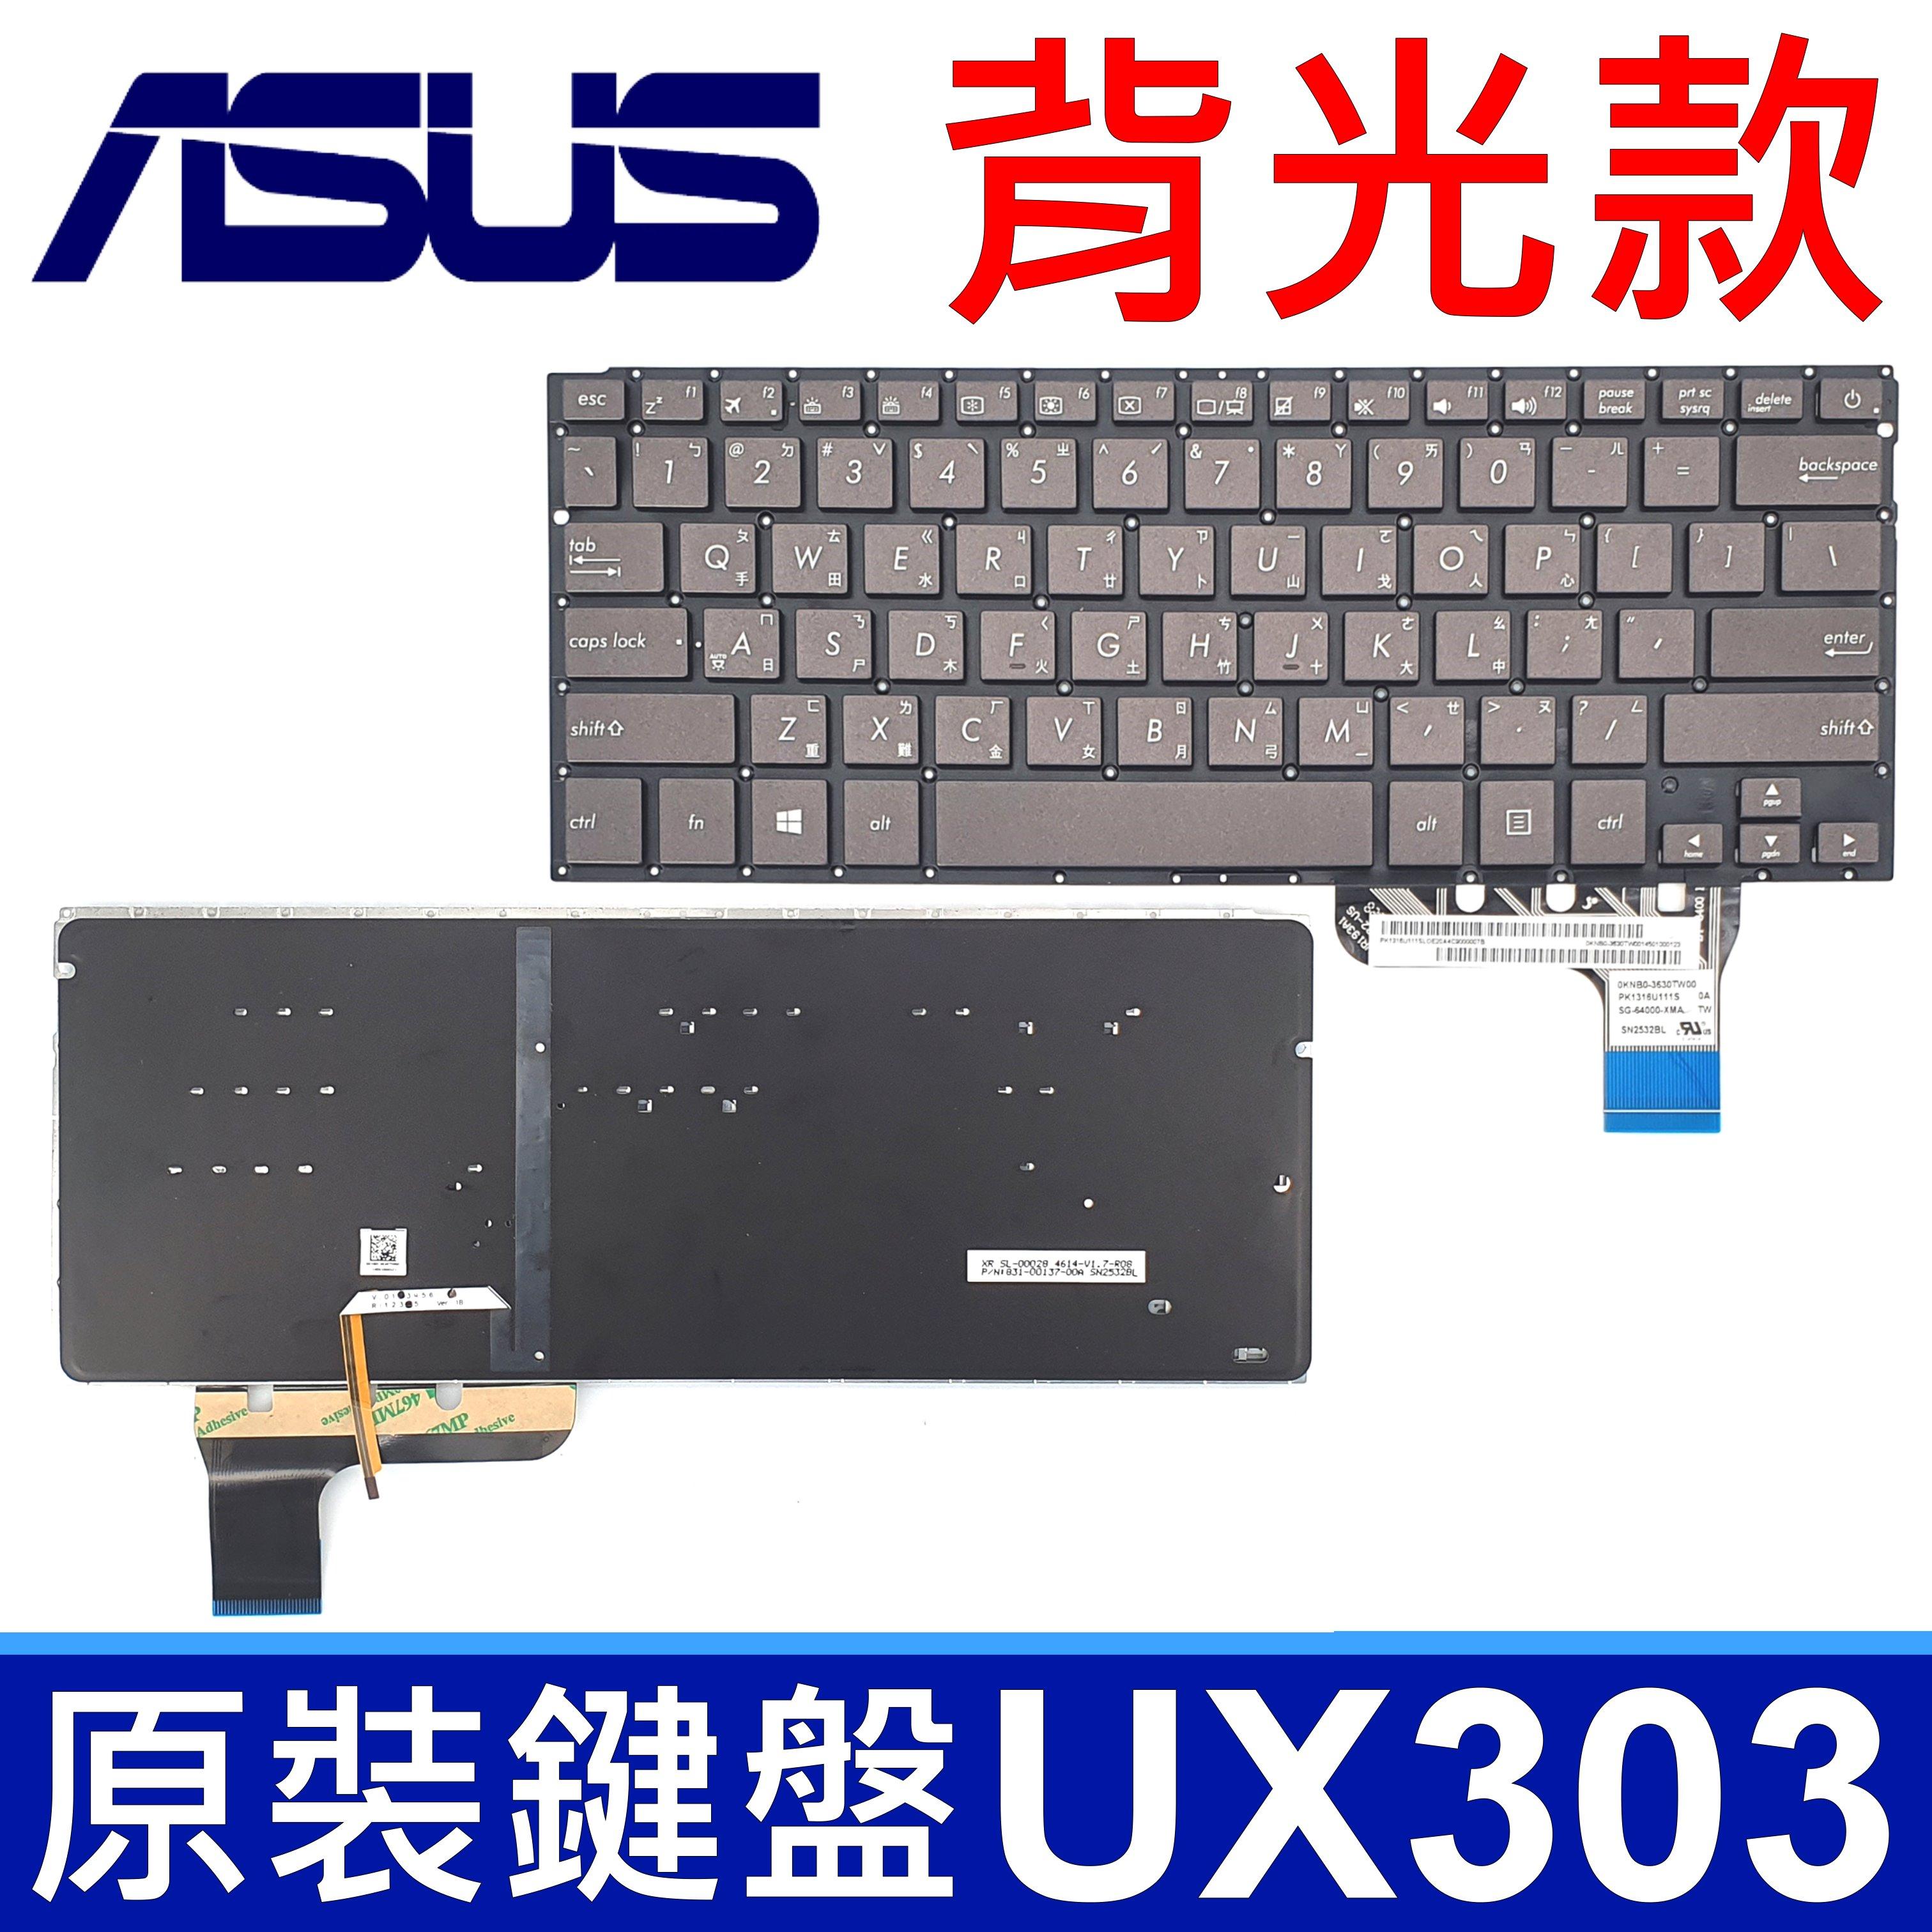 ASUS 華碩 UX303 背光款 繁體中文 筆電 鍵盤 UX303A UX303L UX303U UX303LA UX303LB UX303LN UX303UA UX303UB